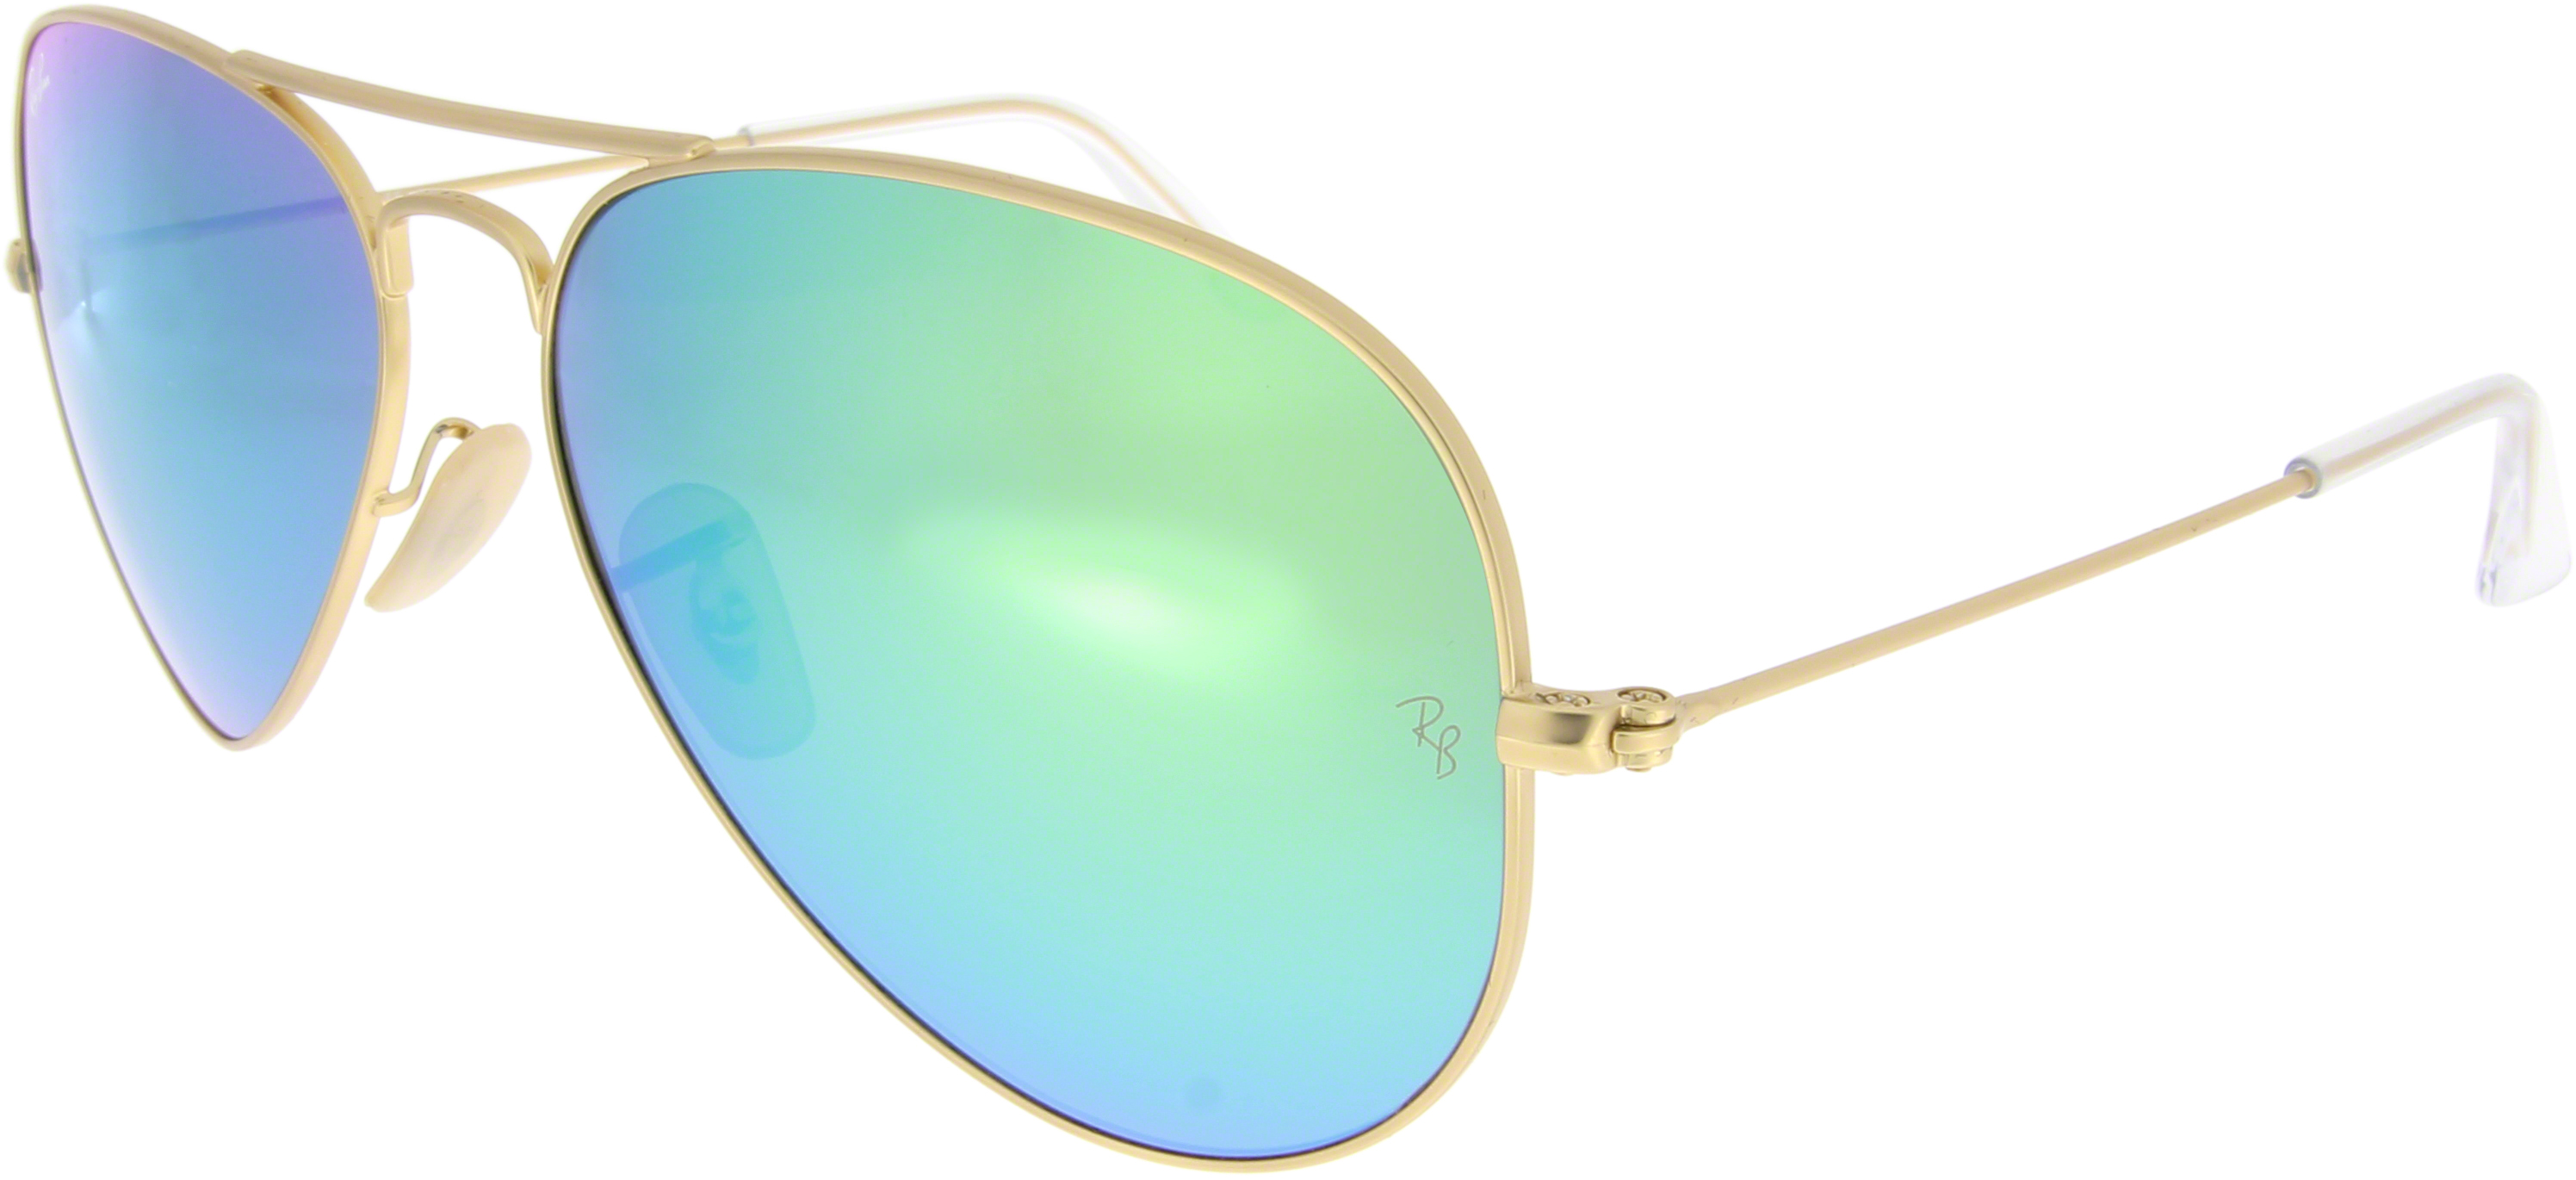 cb224c8af3a Ray Ban Eyeglasses New Zealand « Heritage Malta